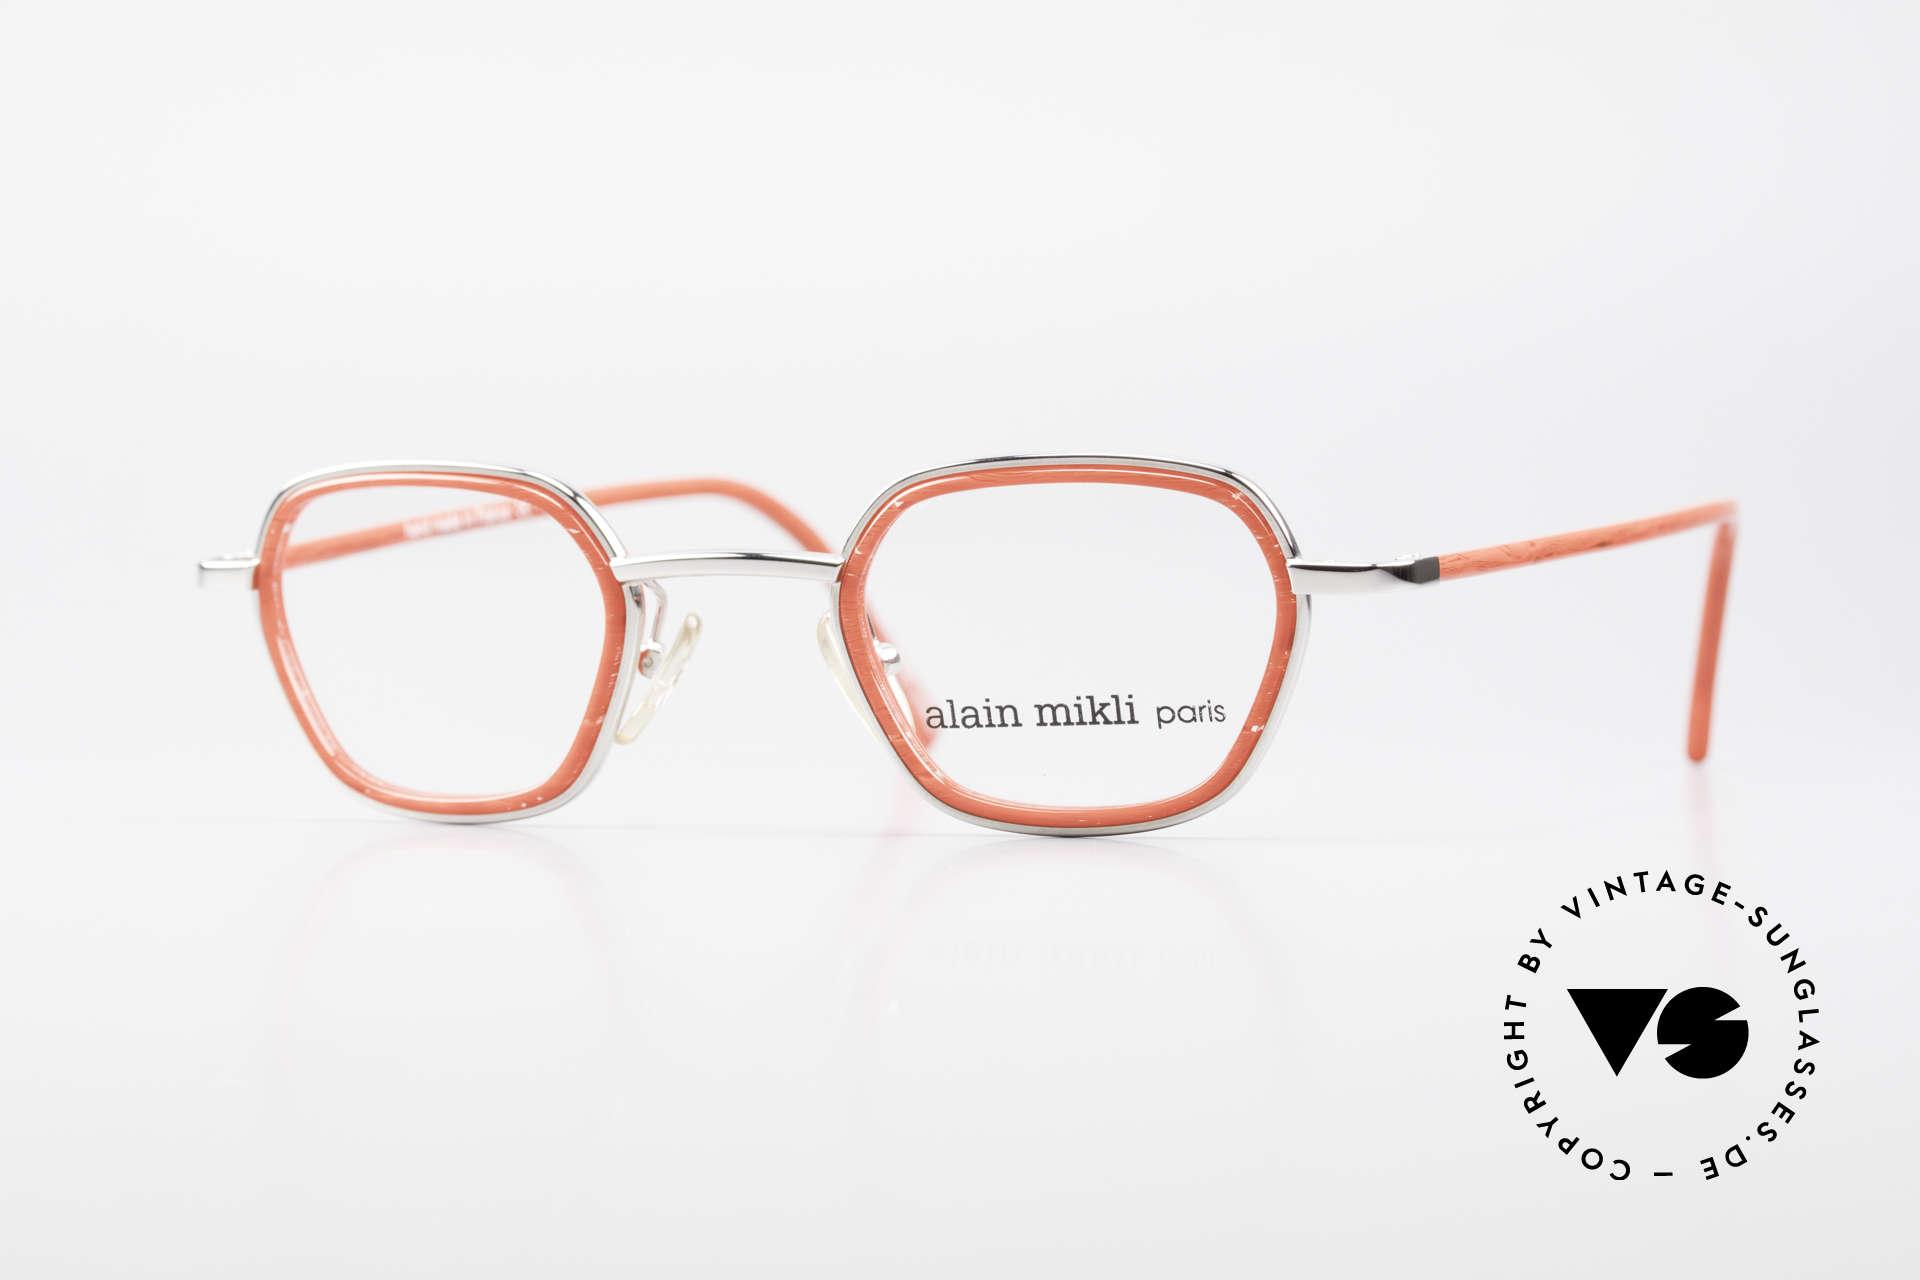 Alain Mikli 1642 / 1006 Vintage Eyeglasses Mikli Red, original Alain MIKLI designer eyeglasses of the 90's, Made for Women